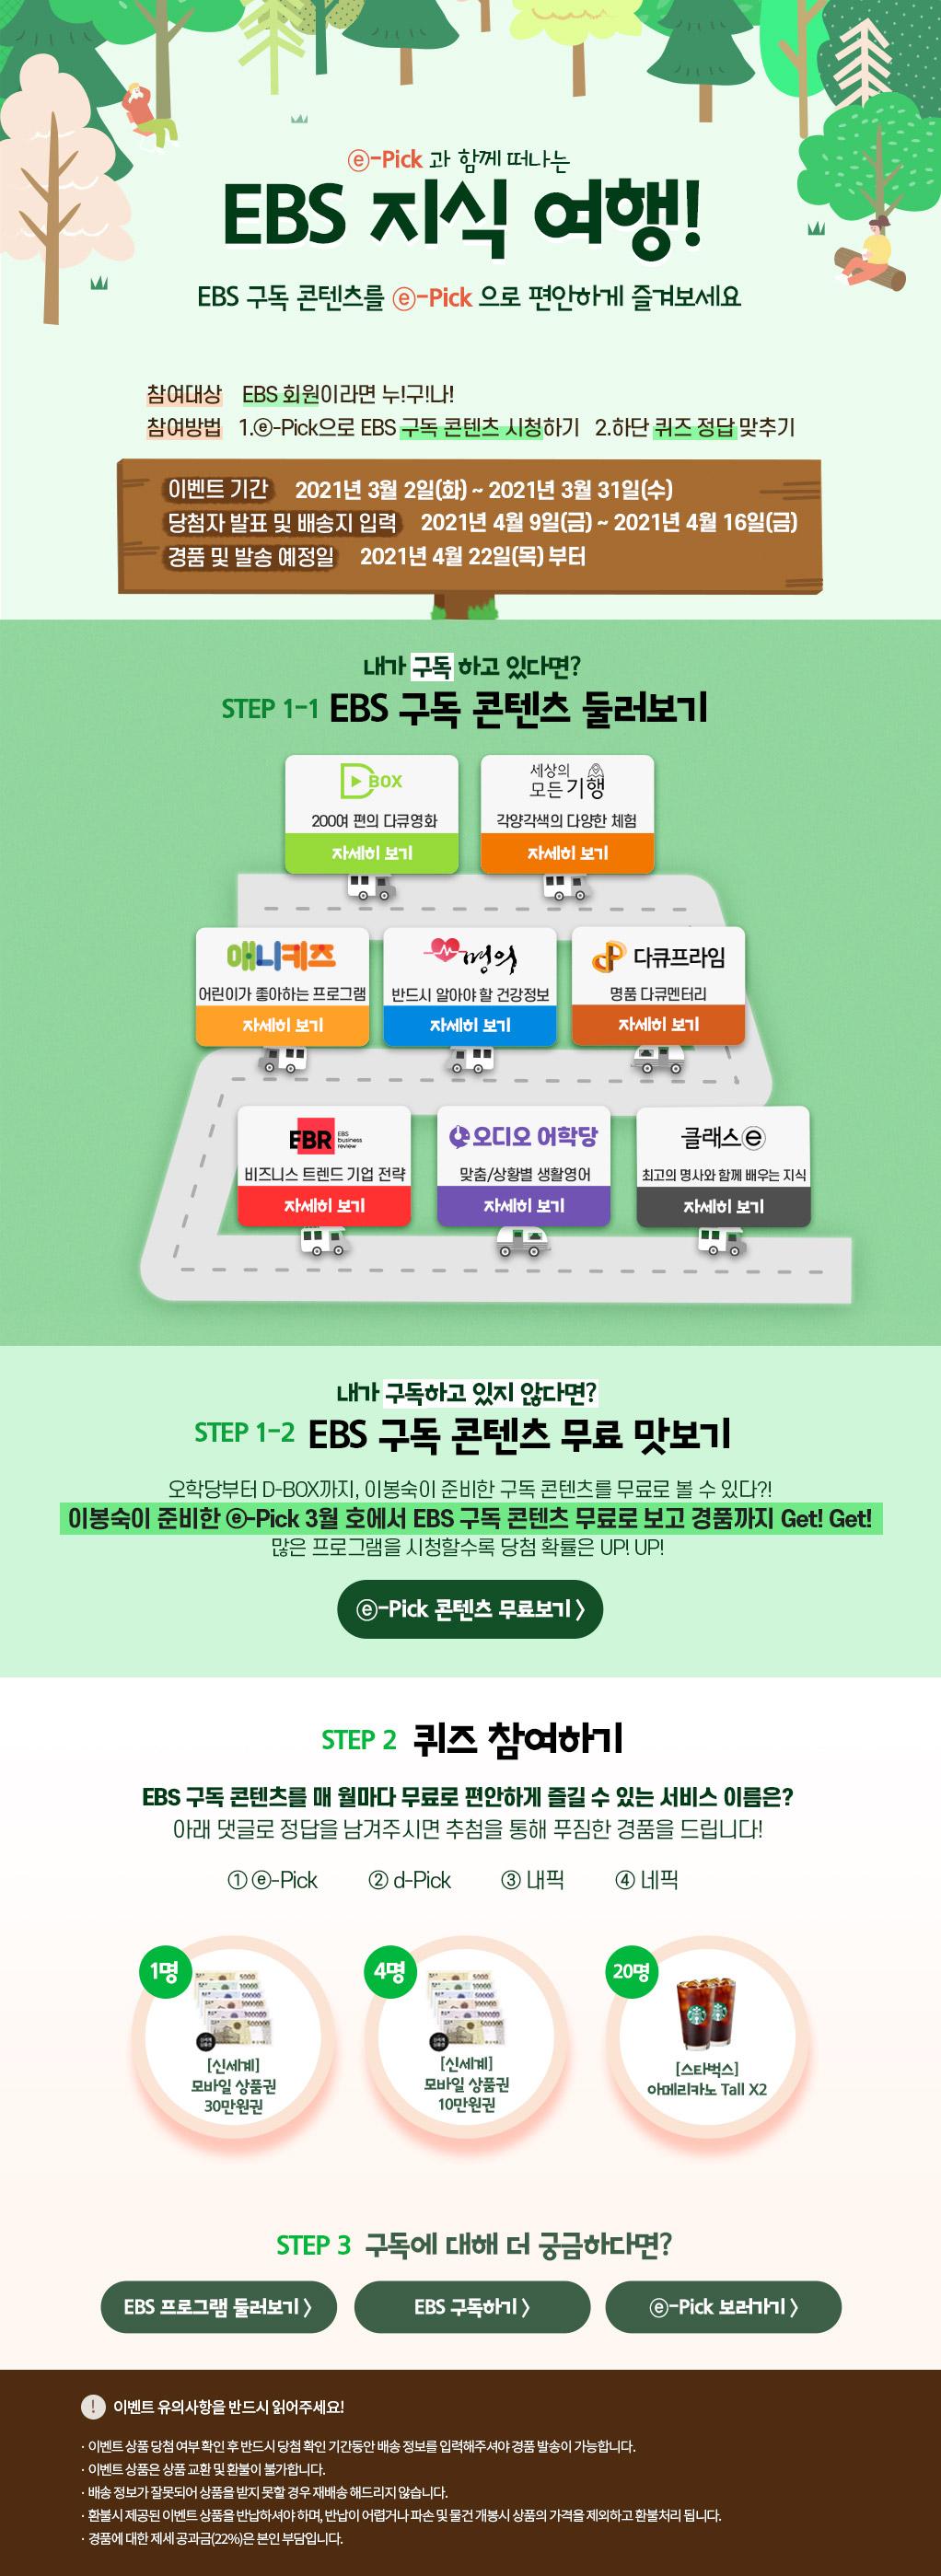 e-Pick 과 함께떠나는 EBS 지식 여행!